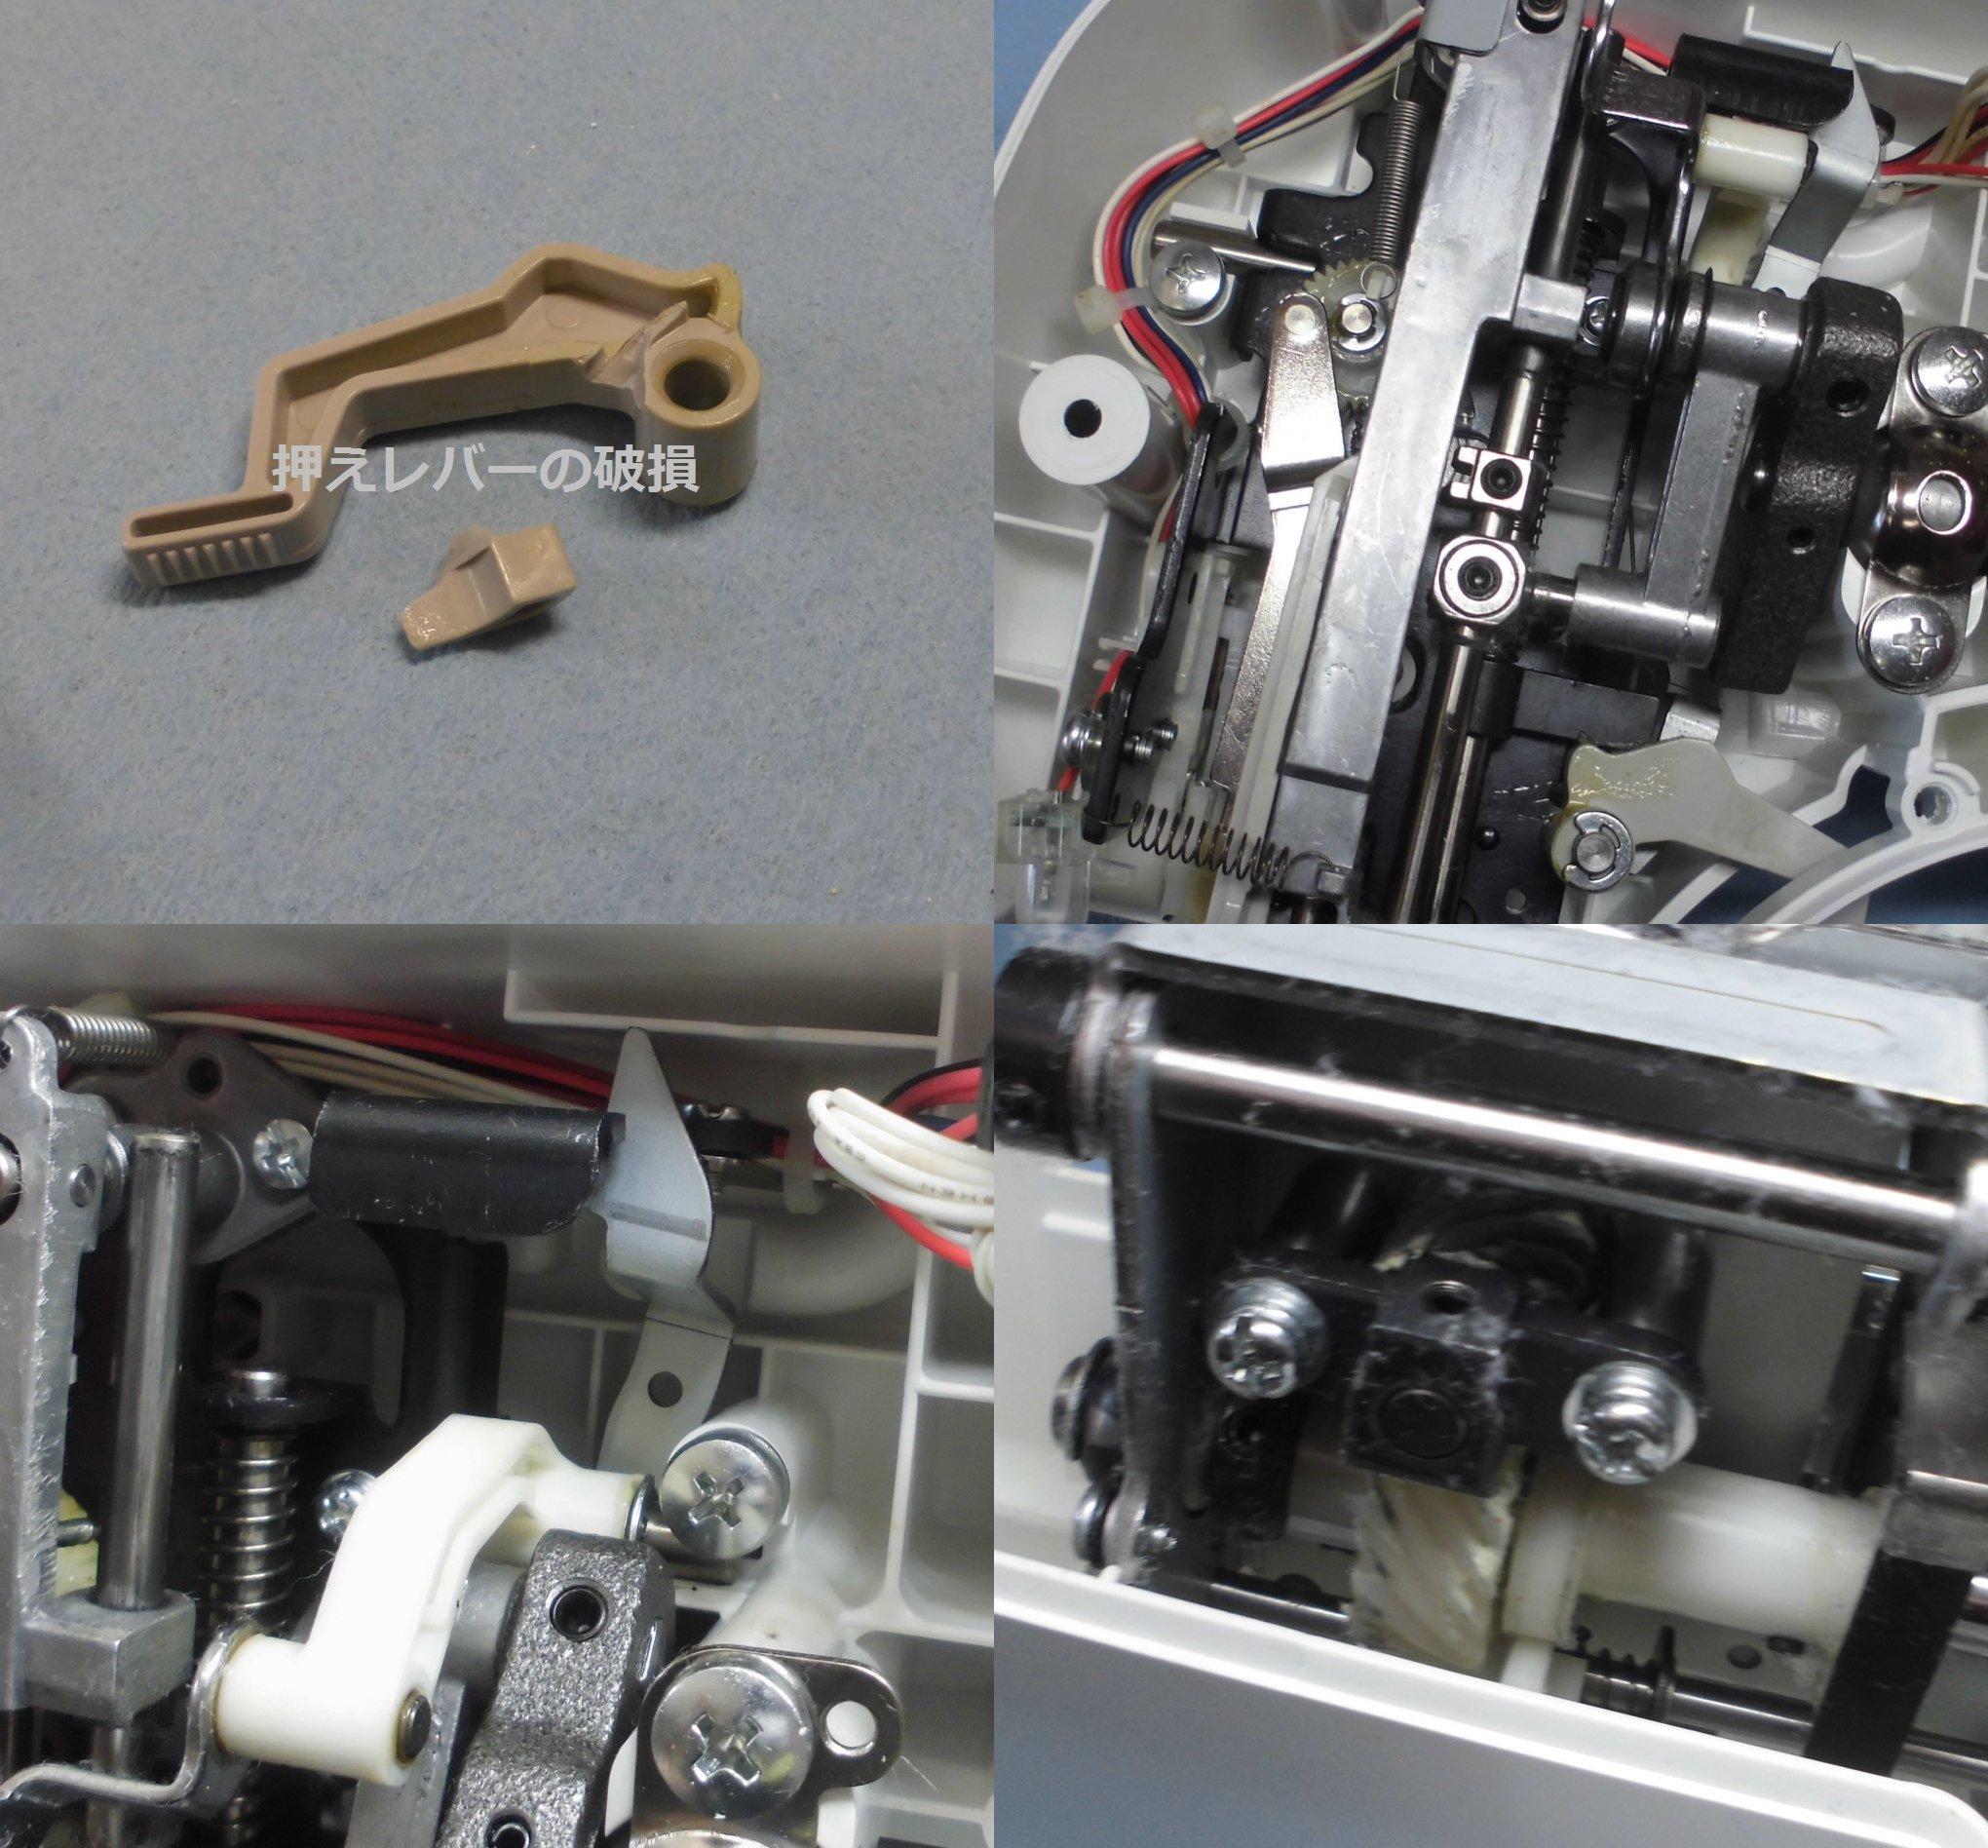 DN001の故障や不具合|押えレバーの破損、部品の交換、糸調子不良、固着